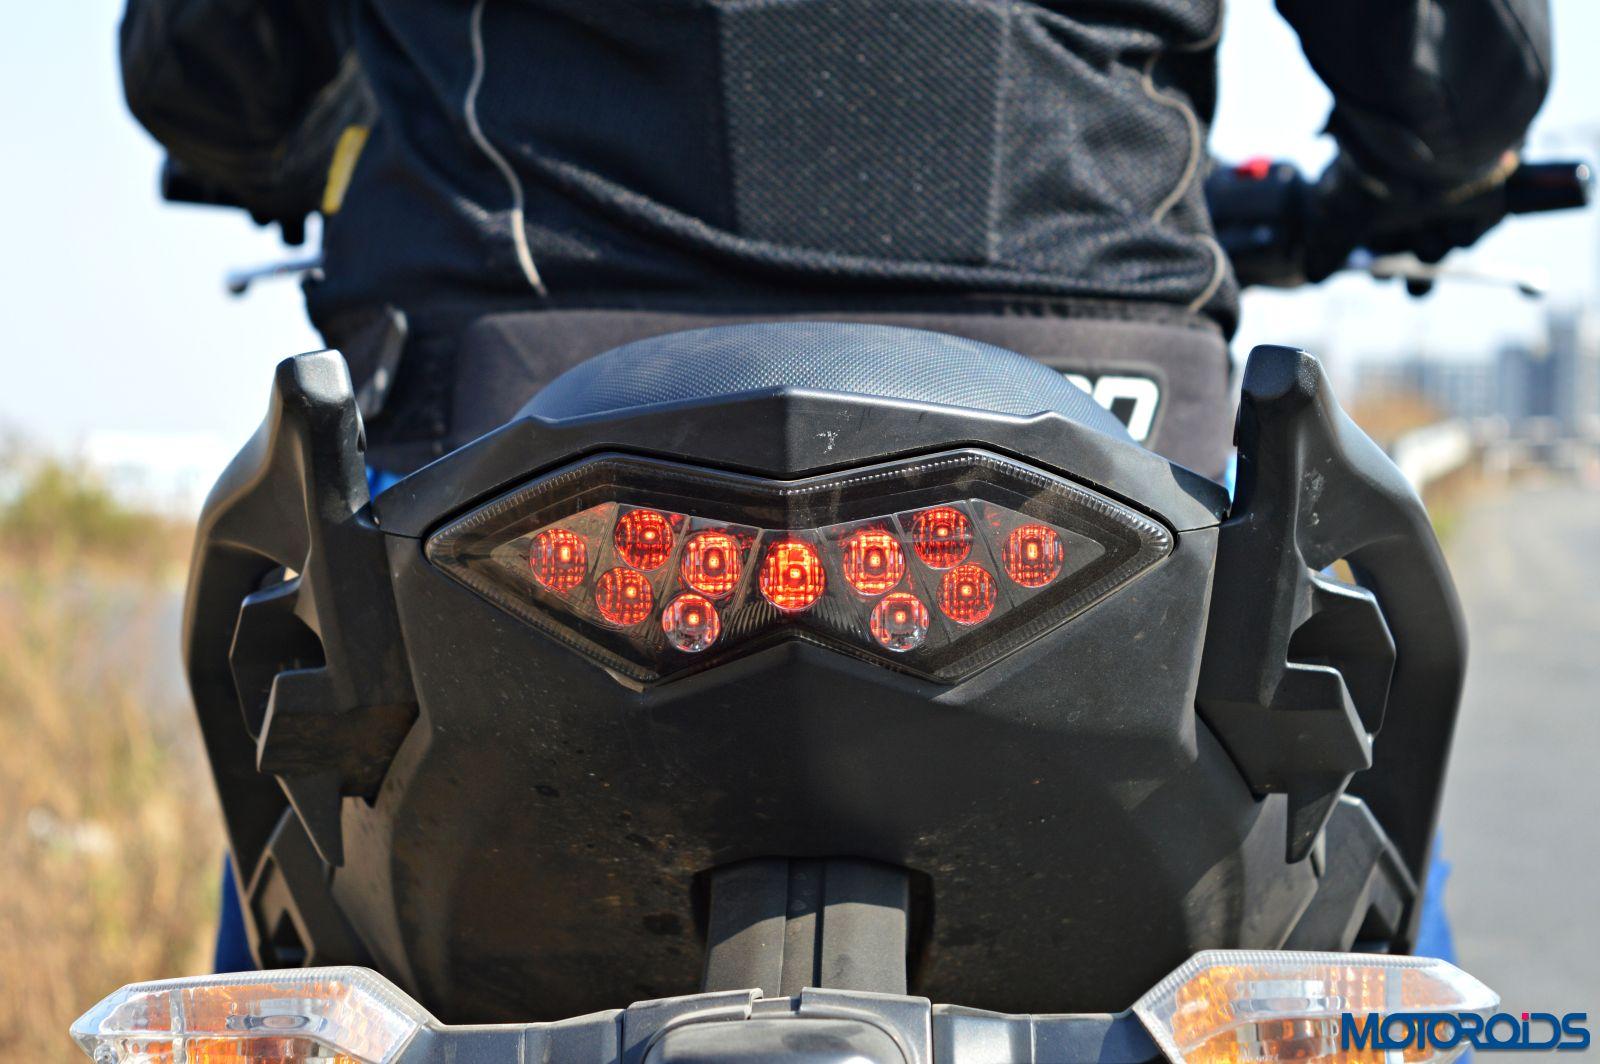 Kawasaki Versys 650 - Review - Details - Tail Light (1)